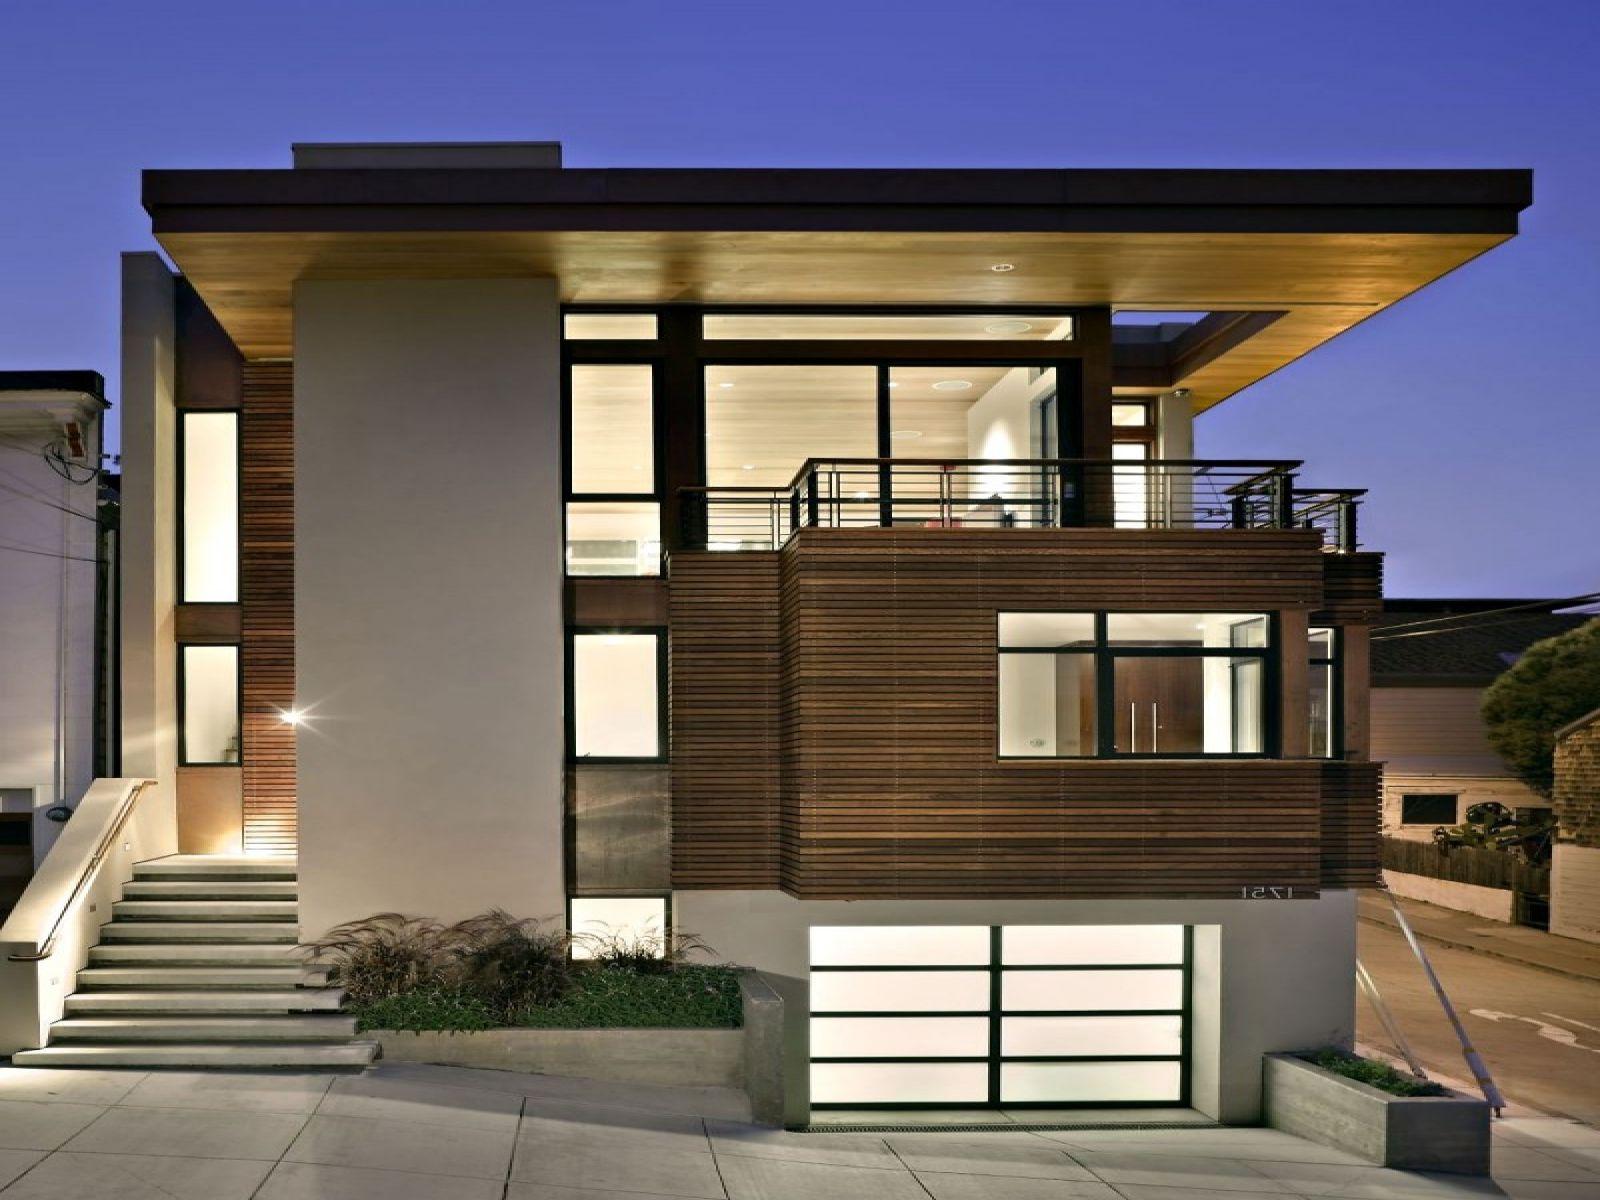 60 Desain Idaman Rumah Modern Masa Kini - Rumahku Unik